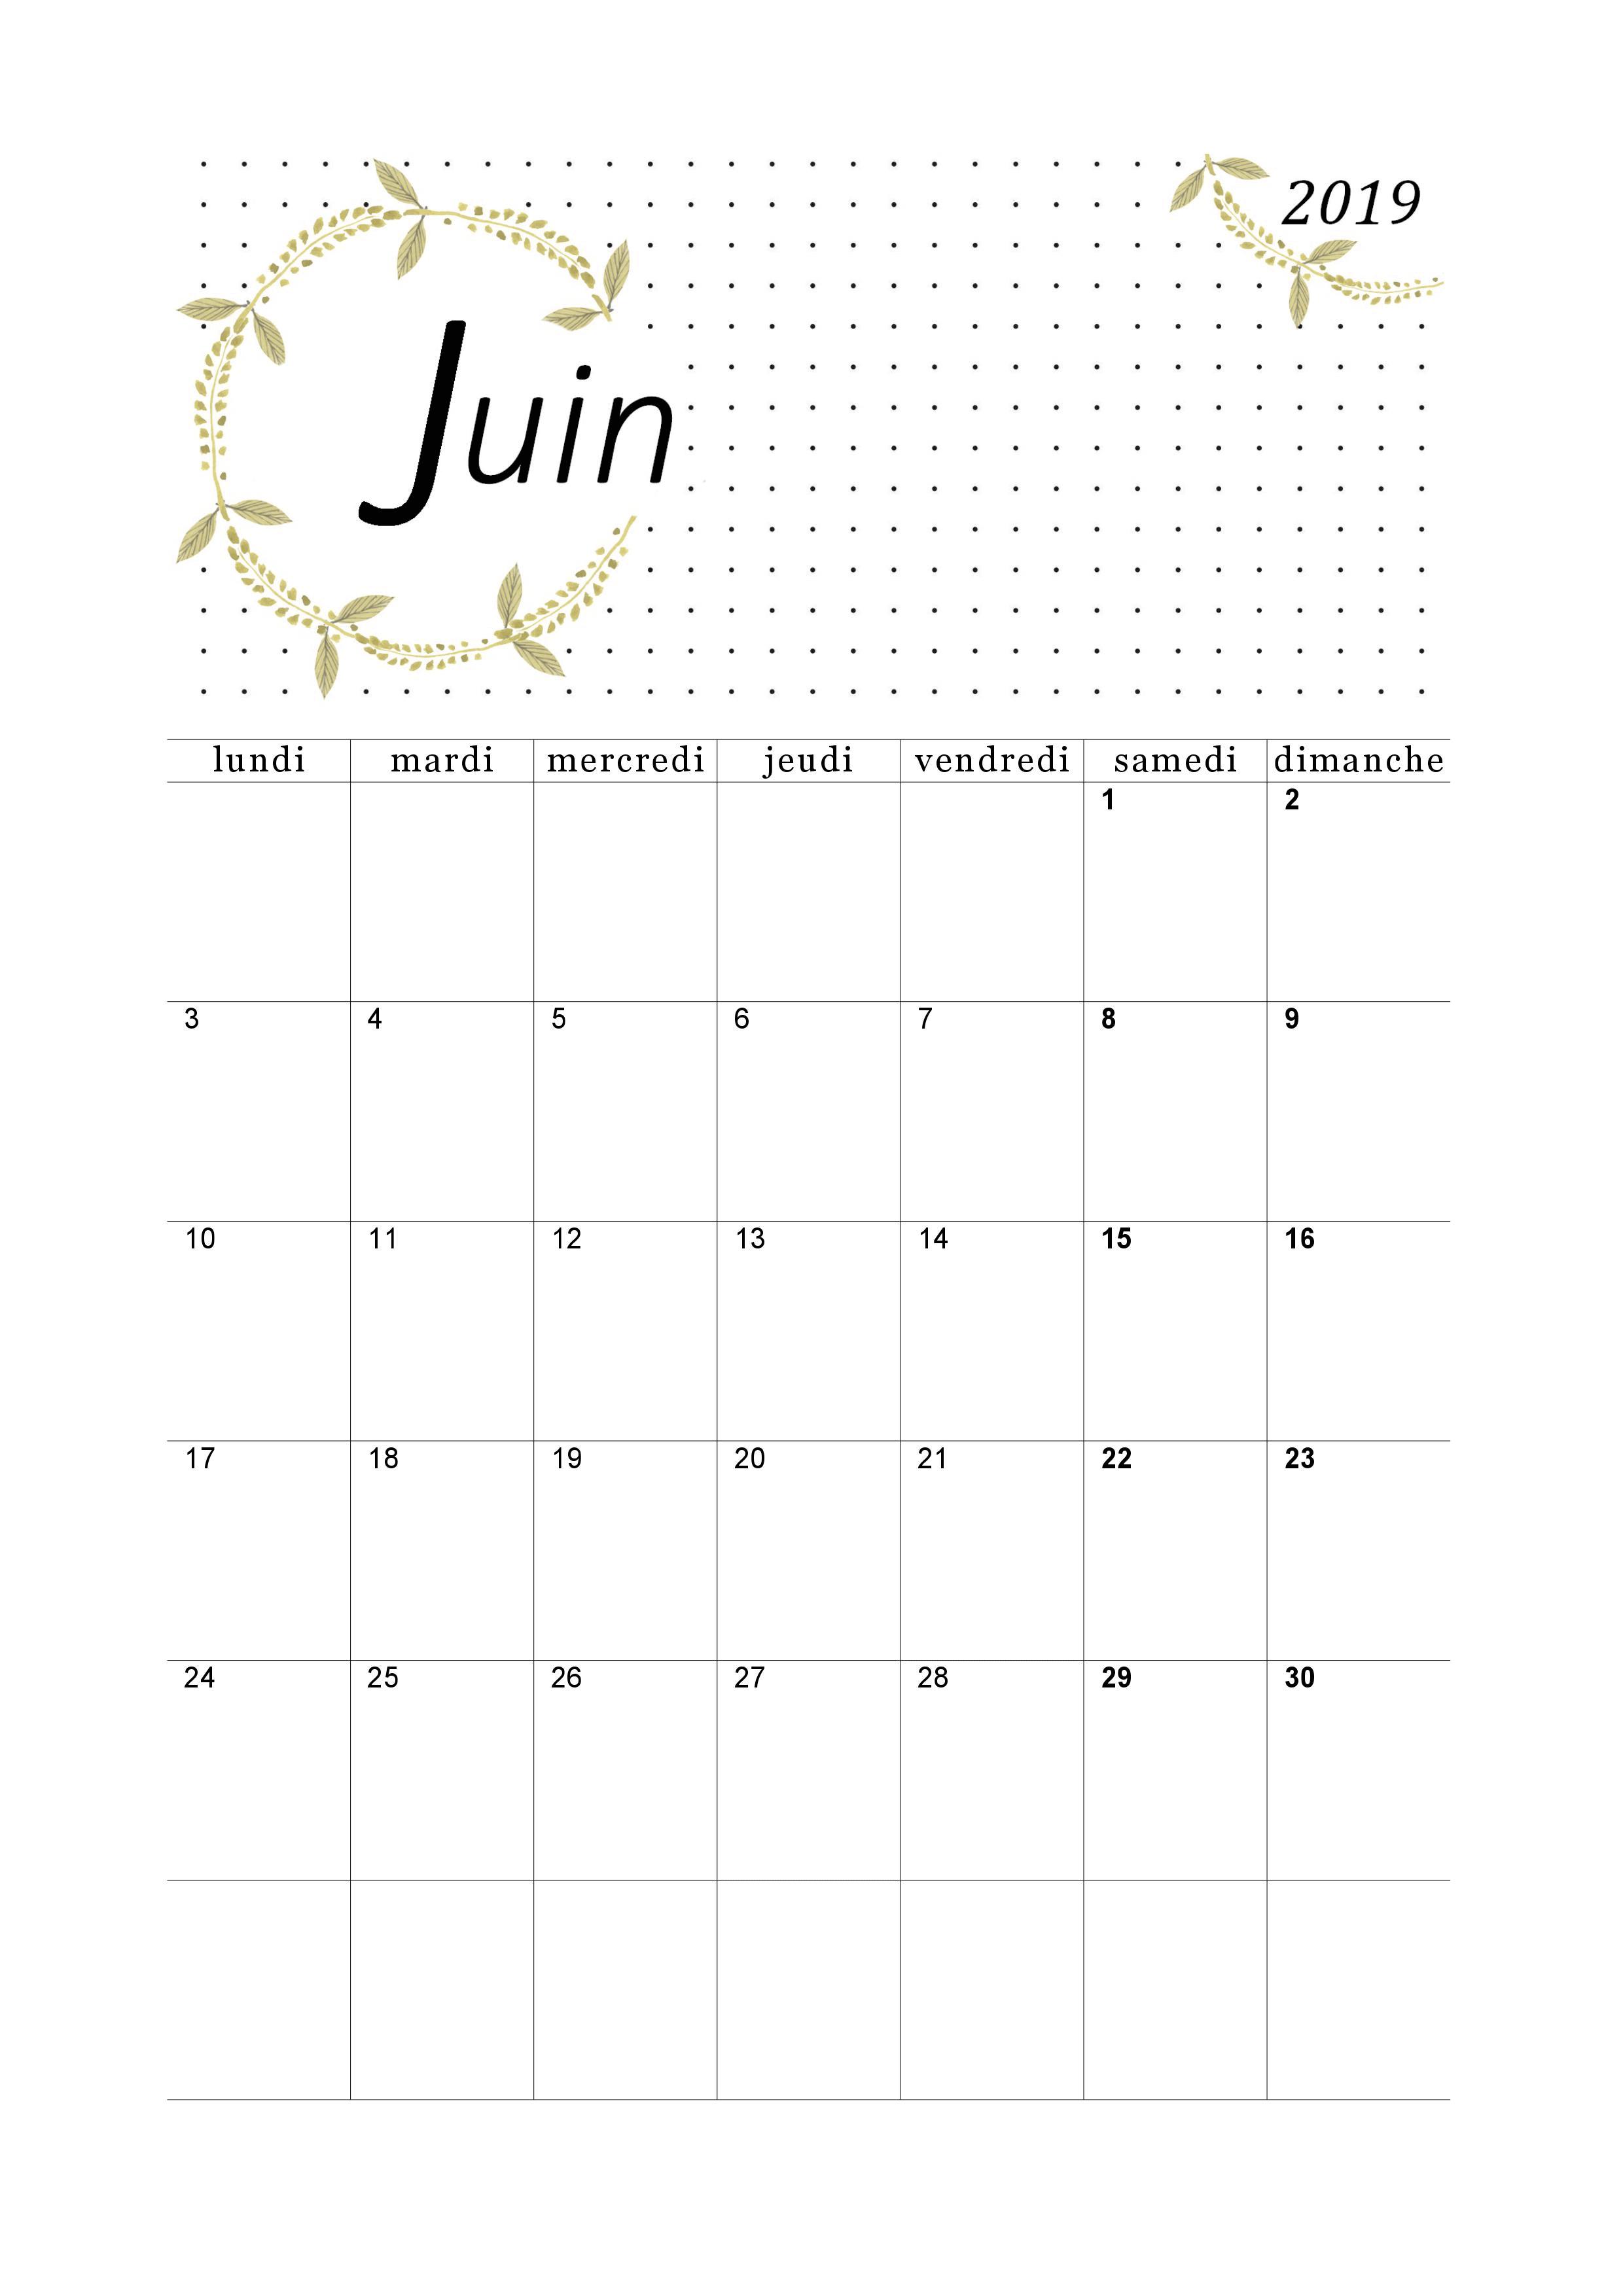 Calendrier Mensuel Juin 2019.Calendrier Juin 2019 A Imprimer Calendriers Imprimables En